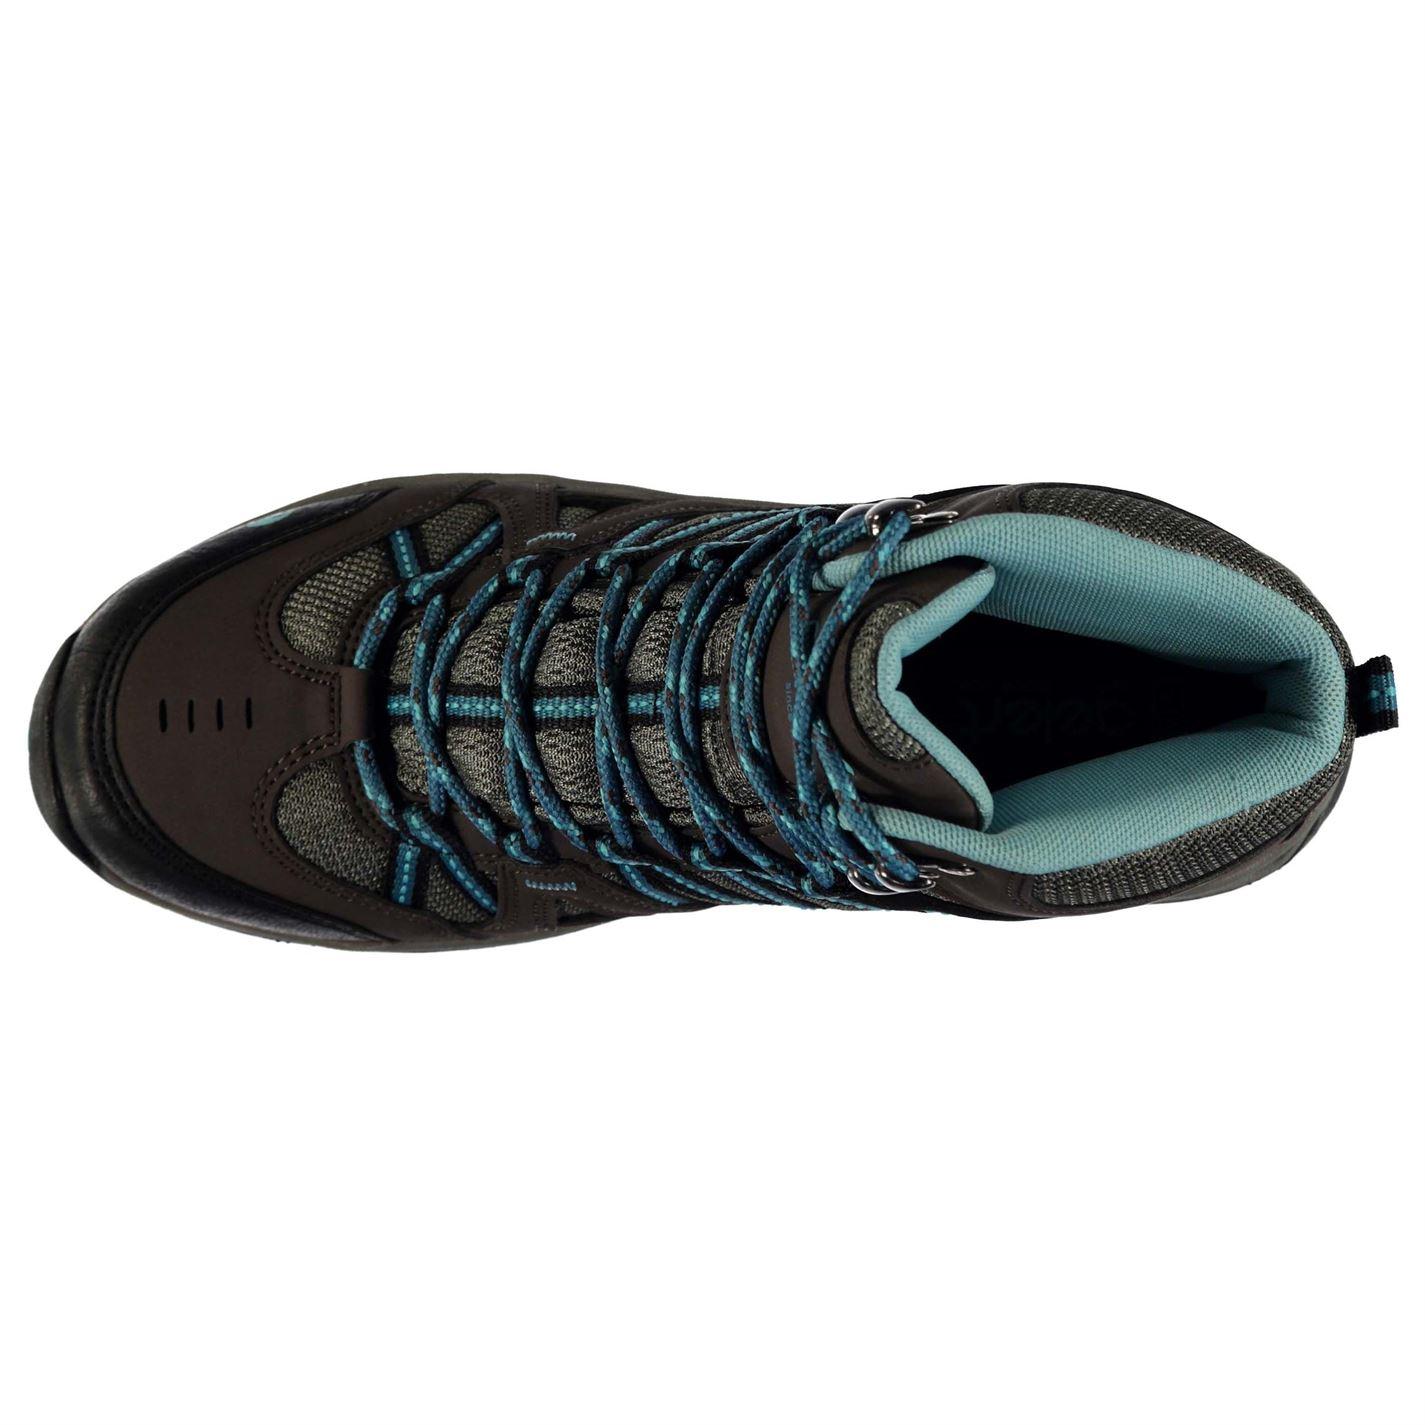 Gelert Femmes Ottawa Mi Walking Boots Lacets fixé Chaussures Outdoor Chaussures